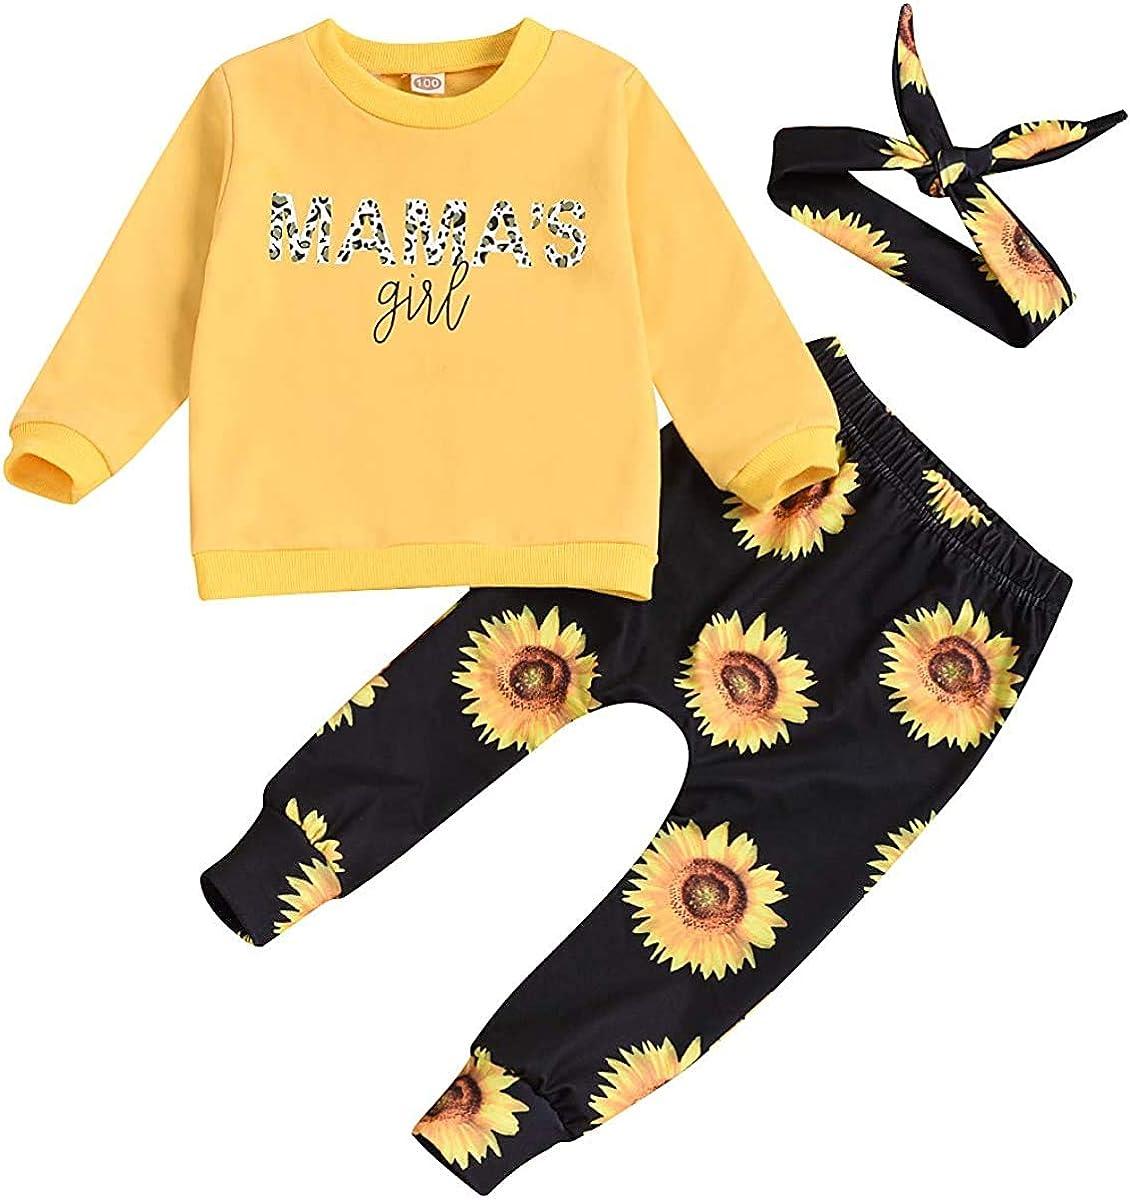 4Pcs Infant Girl Outfits Baby Sister Bodysuit Tops Floral Leggings Pants Set Bowknot Headbands Newborn Pajamas Clothes